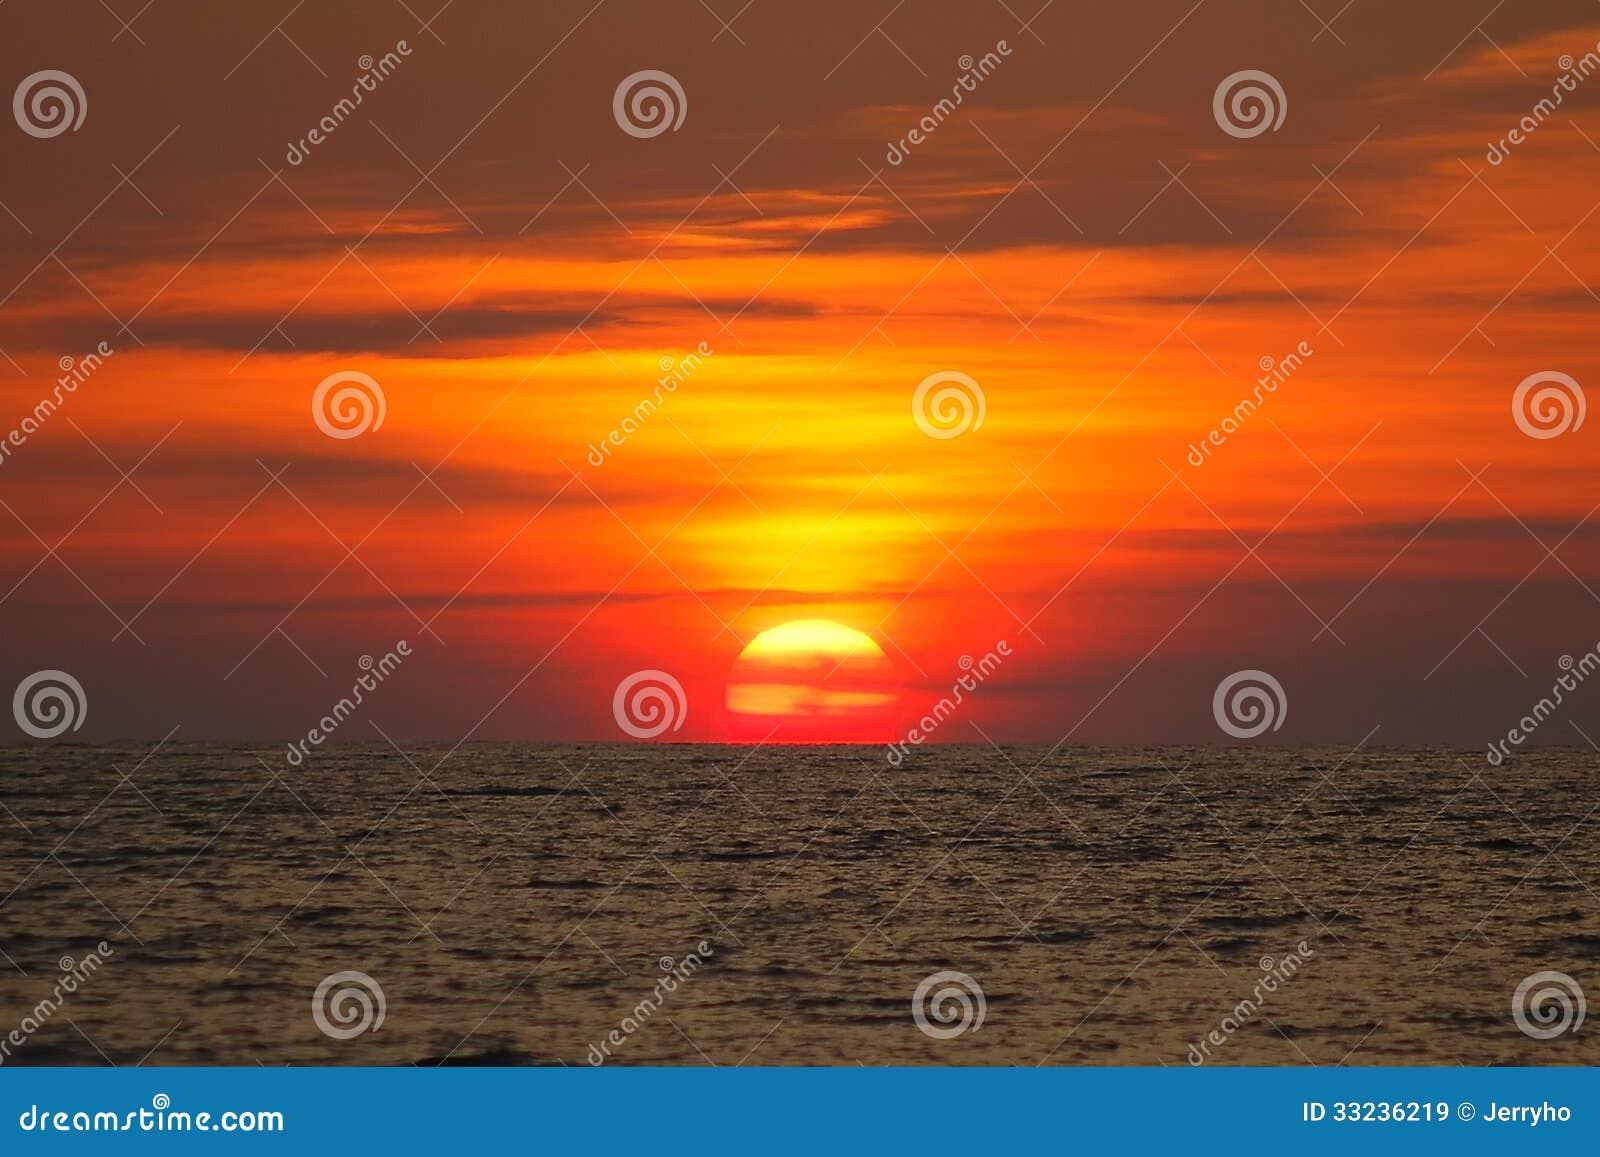 Sunset Half Svg – HD Wallpapers